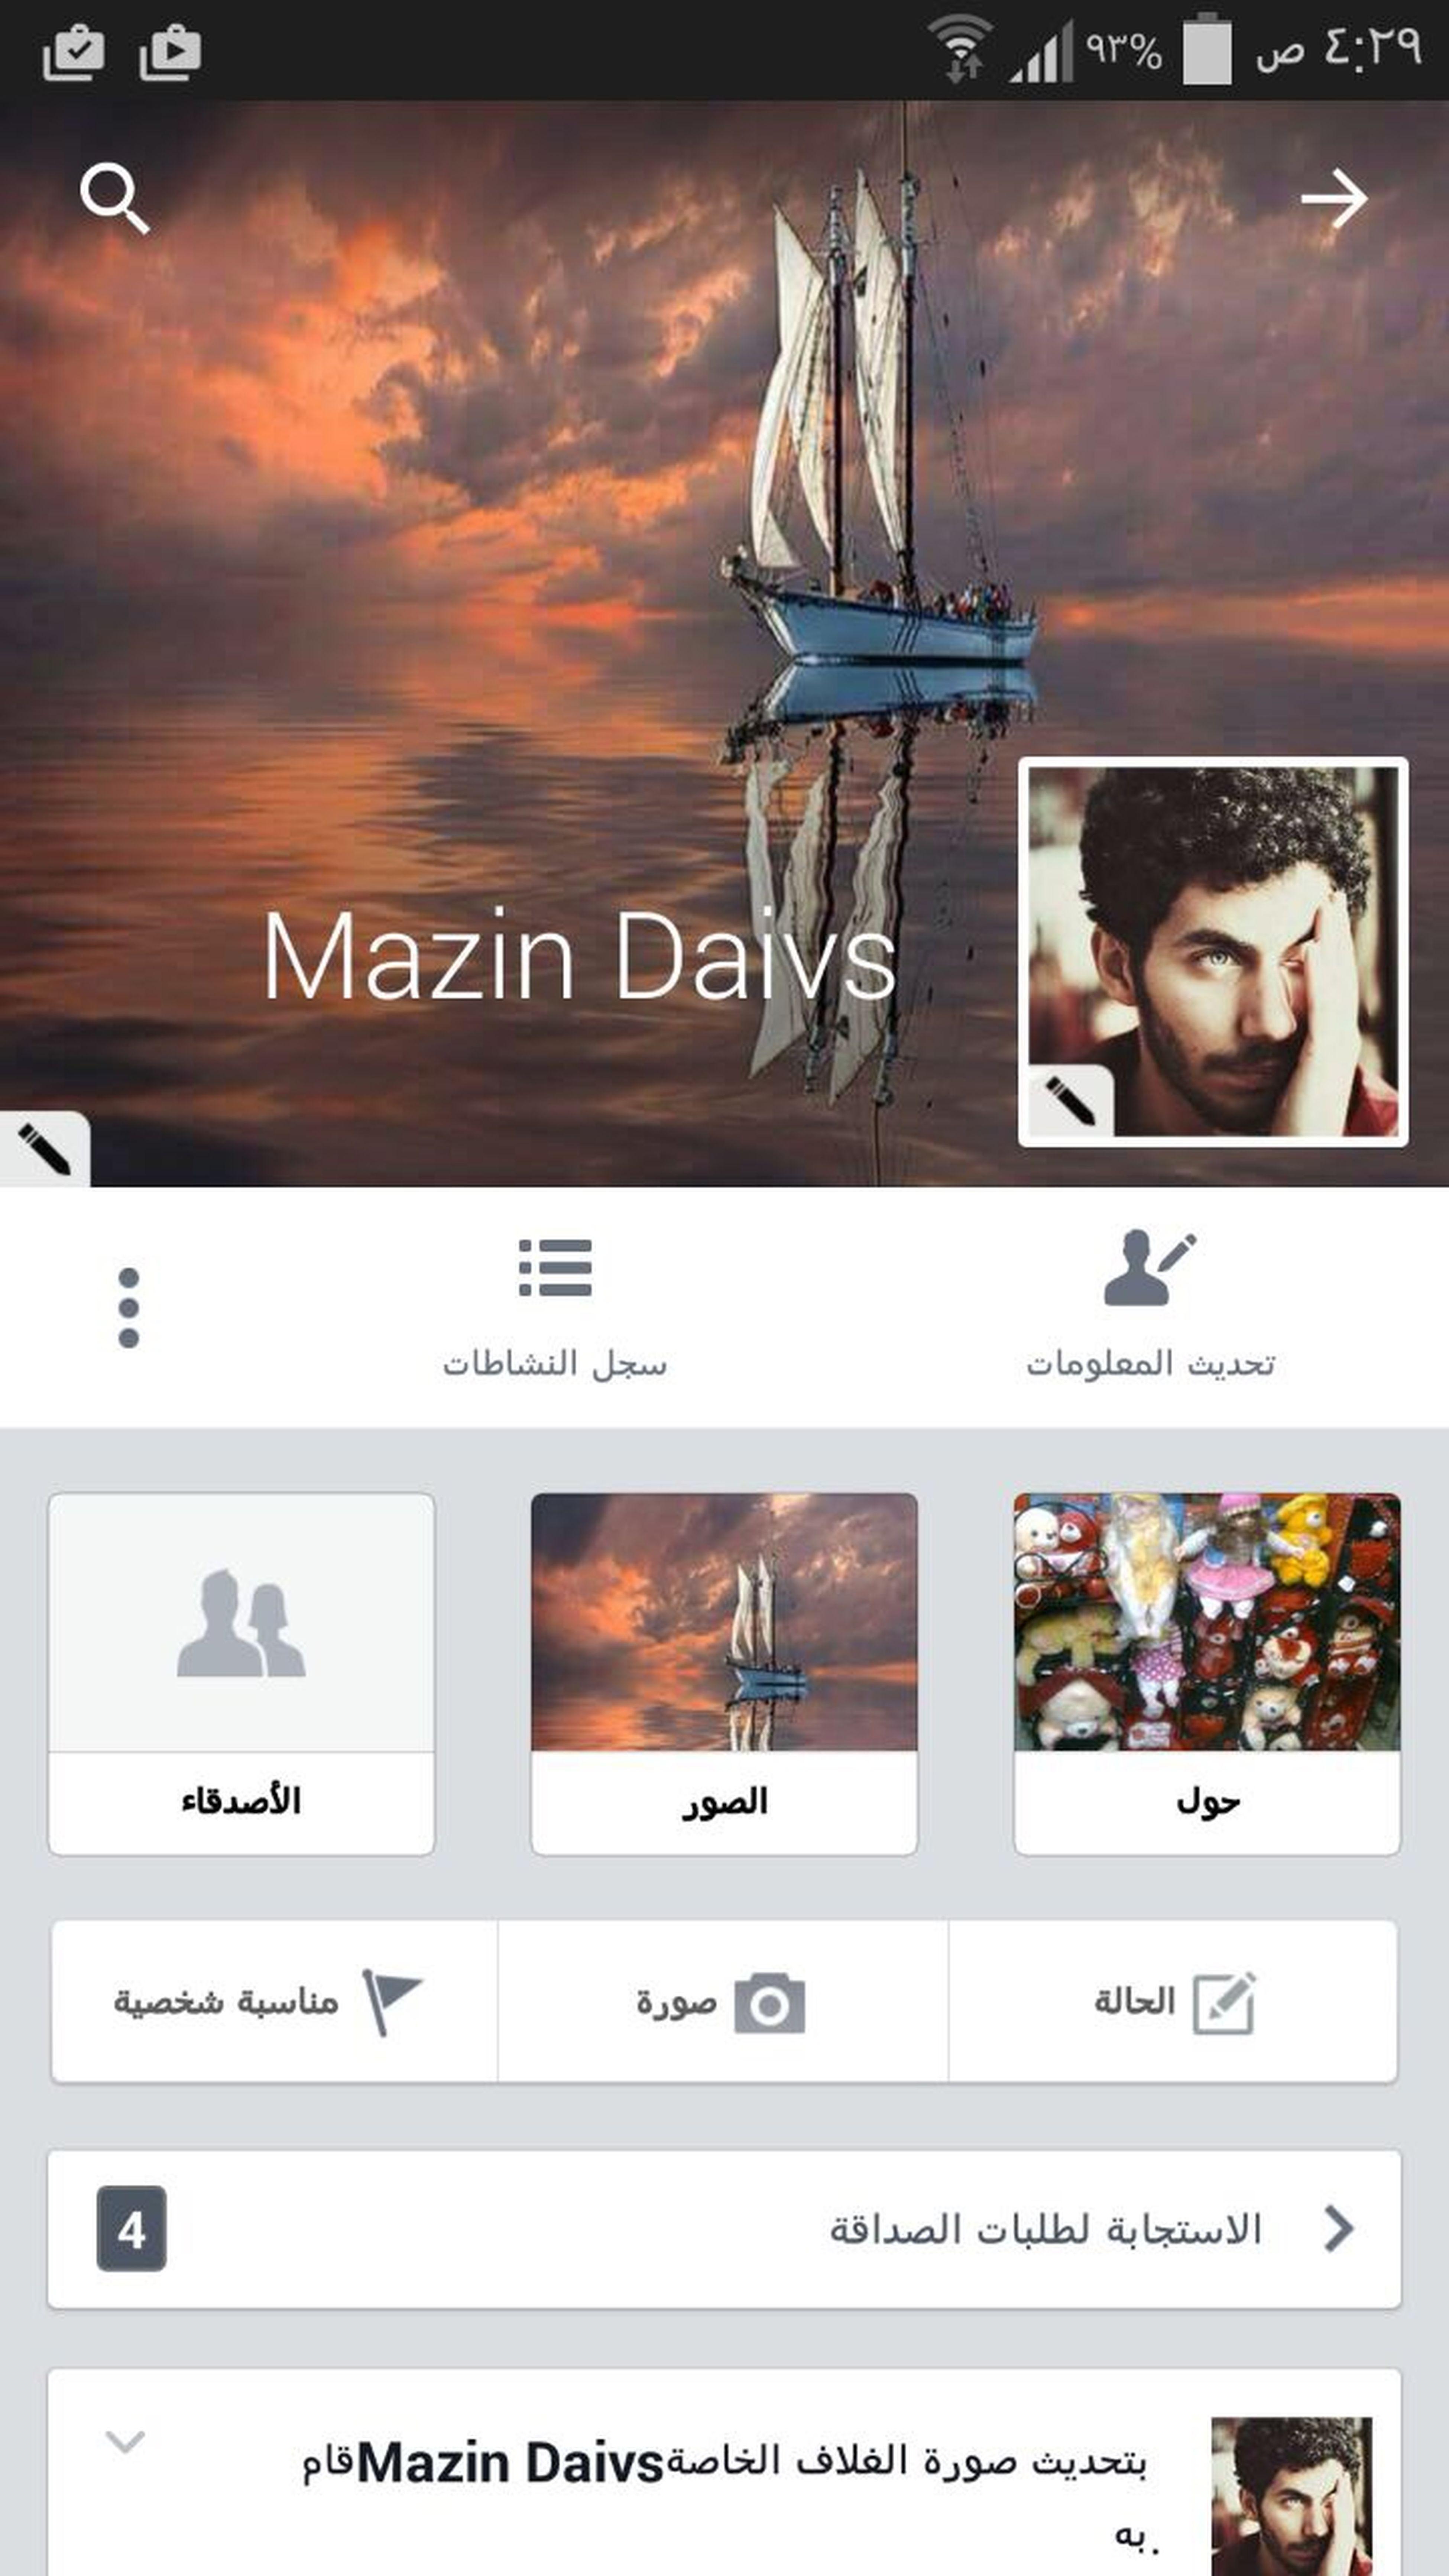 My Facebook account